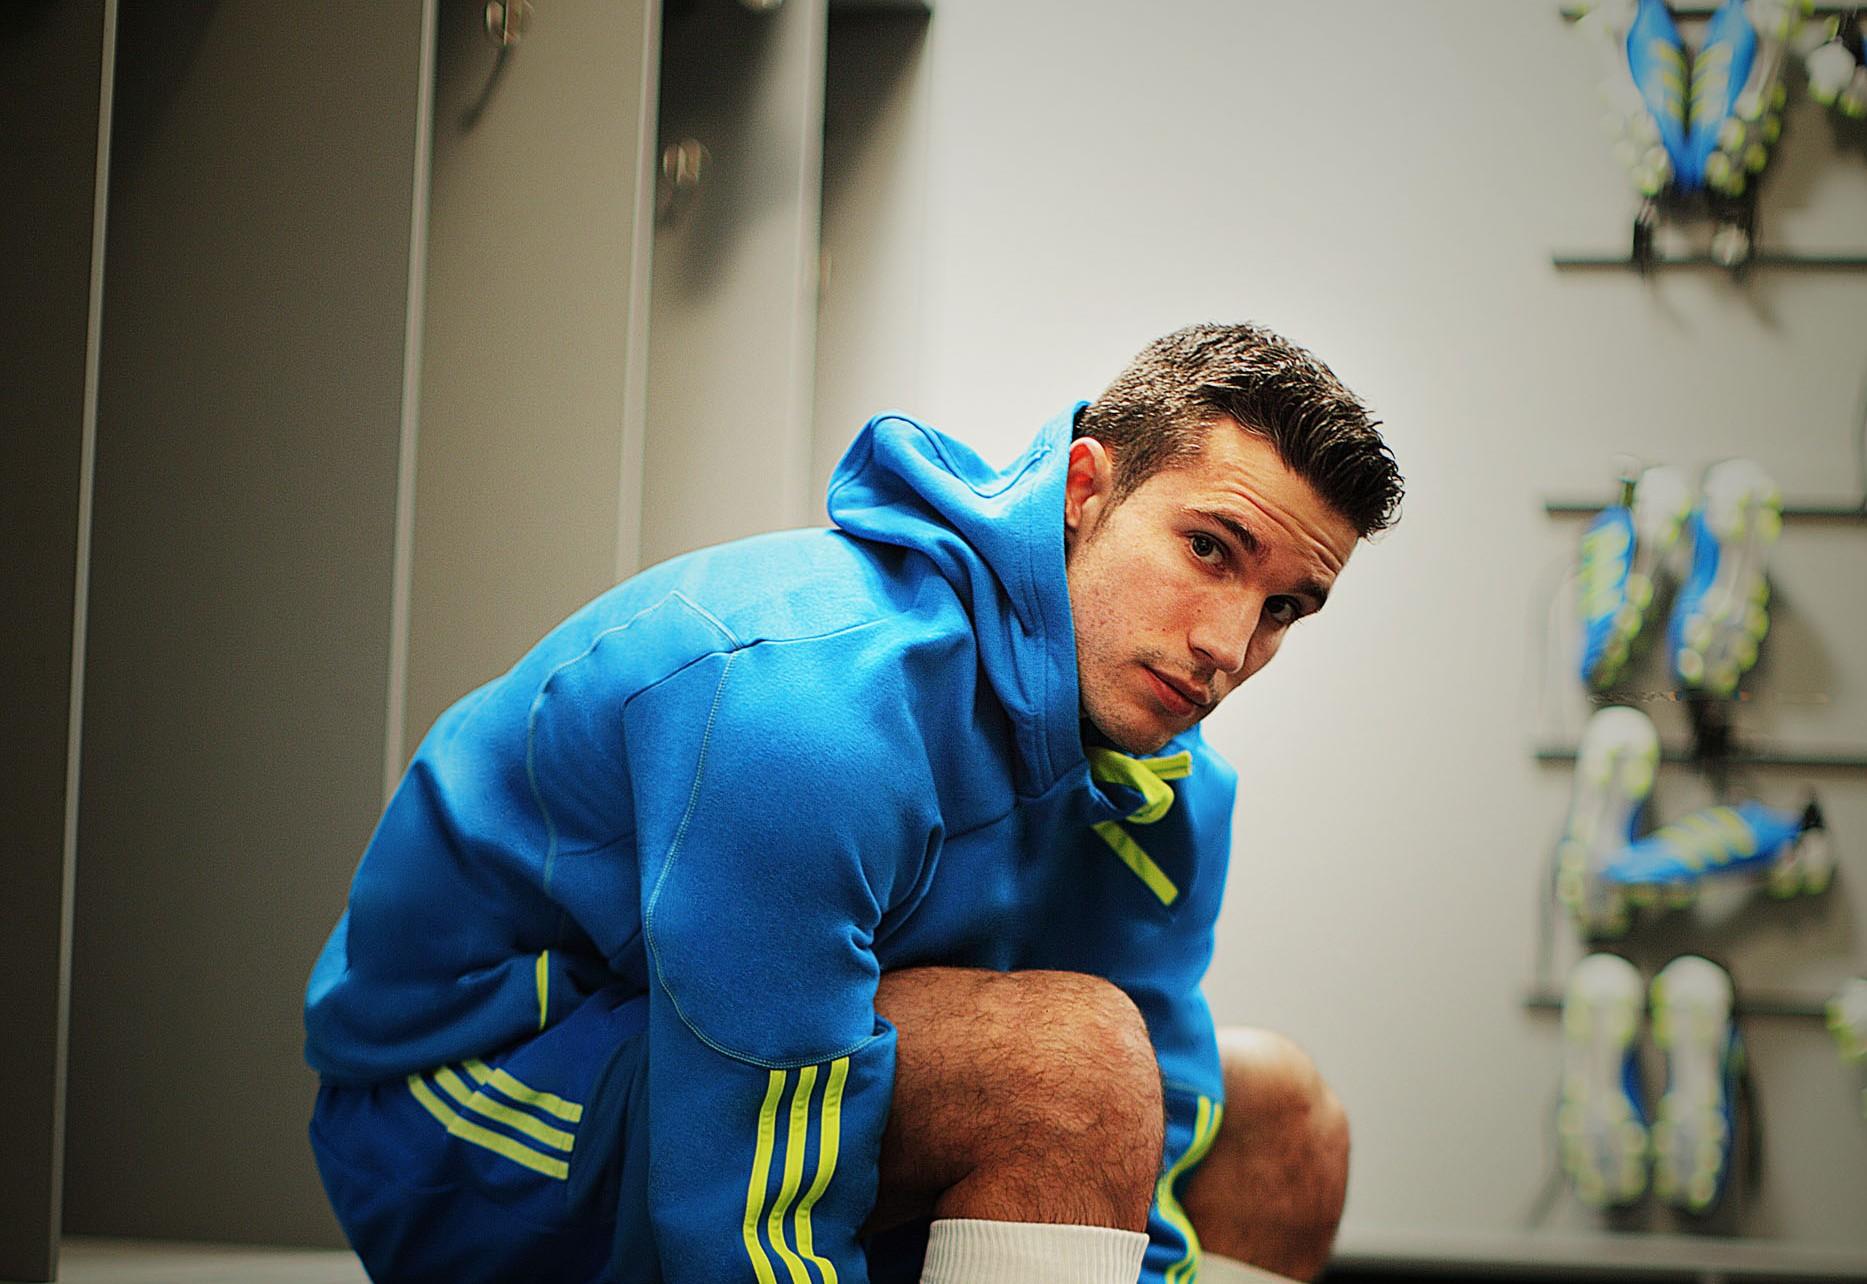 Adidas | Rotterdam Roots of Robin van Persie